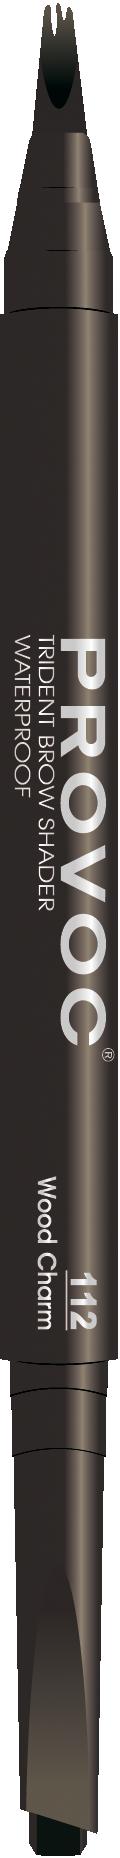 PROVOC Подводка двусторонняя гелевая для бровей, 112 коричневая / (L) Trident Brow Shaper 7 г